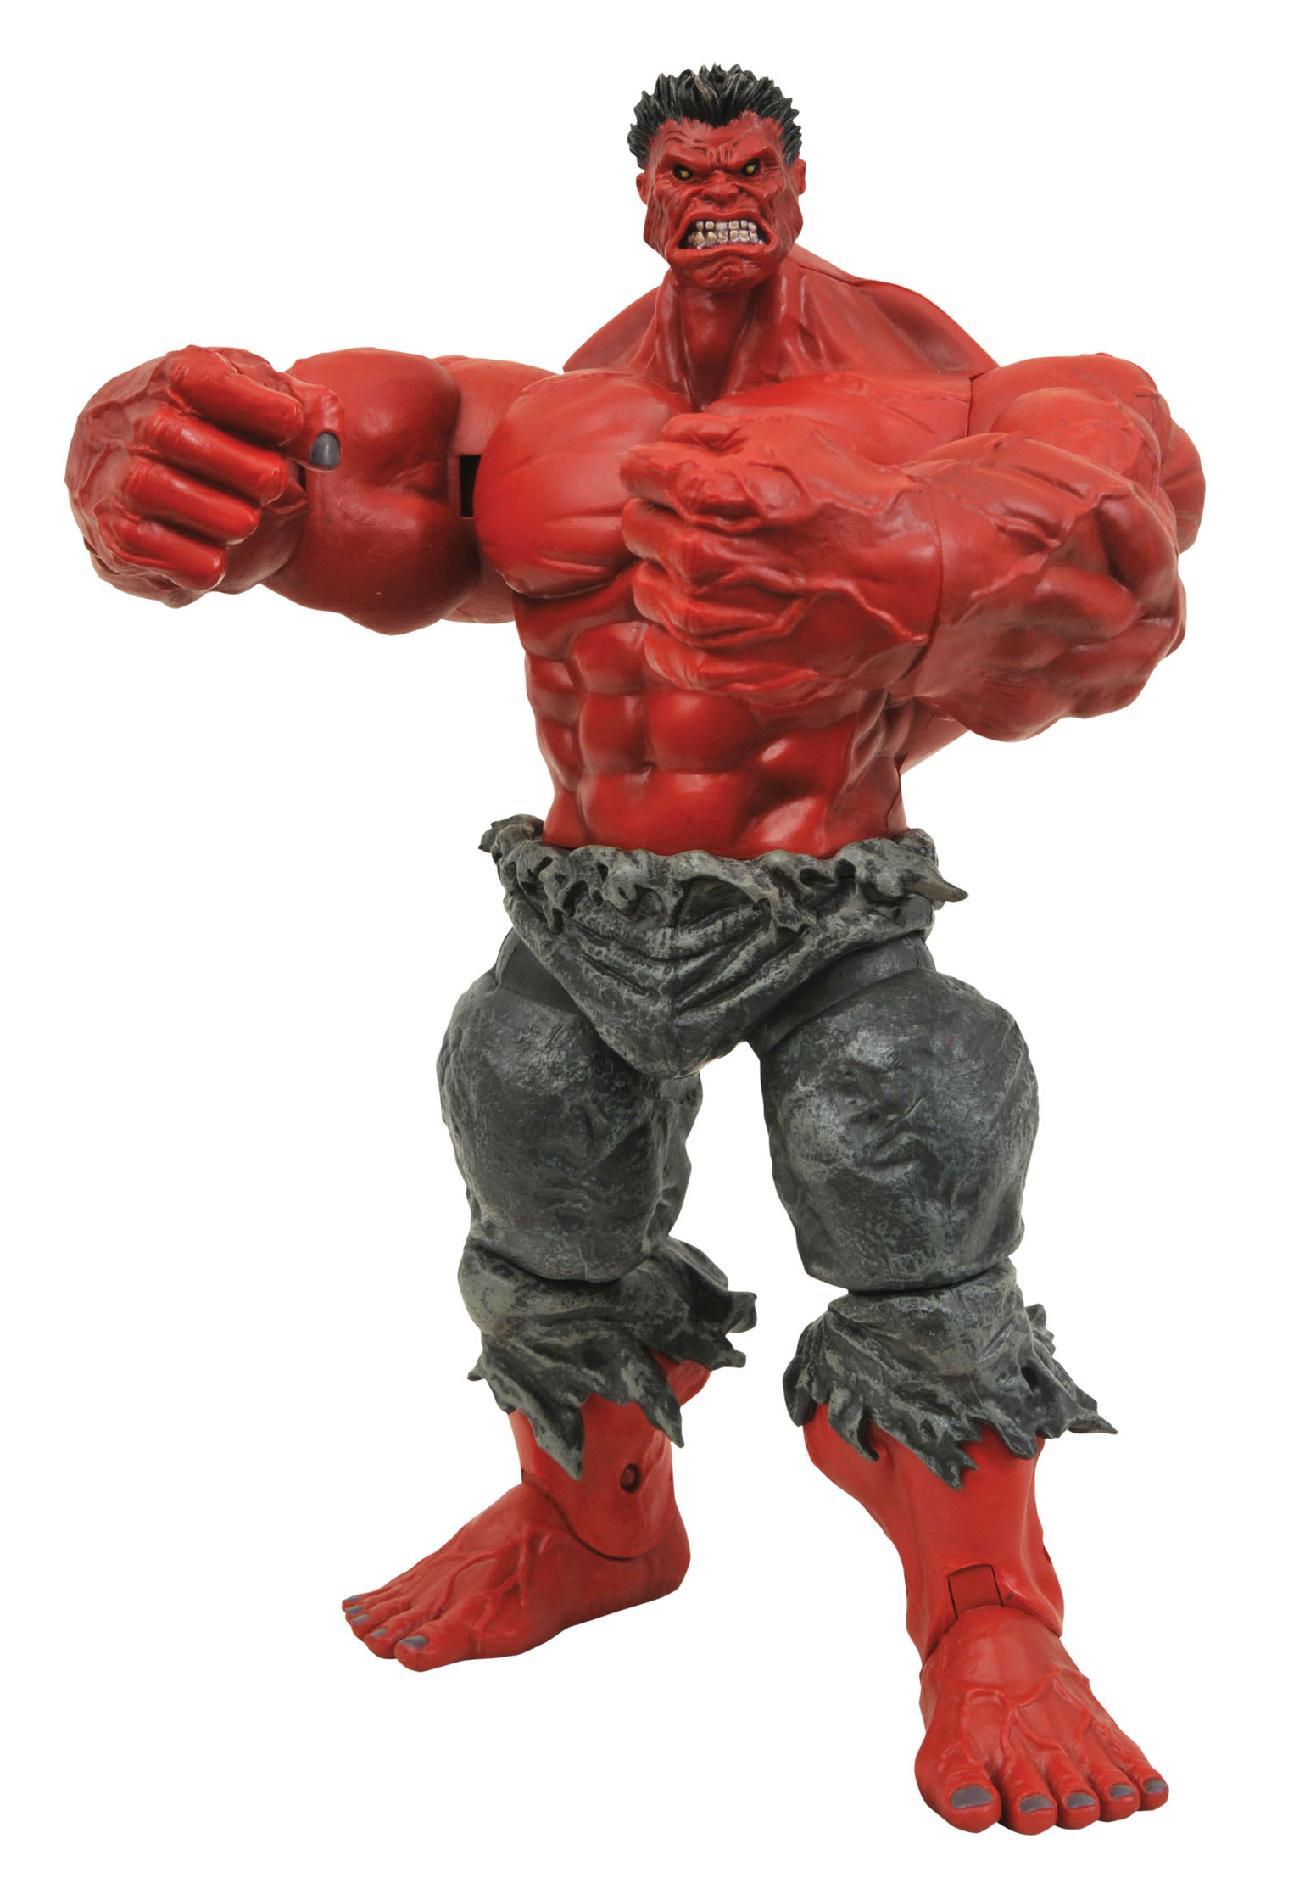 Diamond Select Toys MARVEL SELECT RED HULK ACTION FIGURE PartNumber: 05237582000P KsnValue: 05237582000 MfgPartNumber: MAR088262